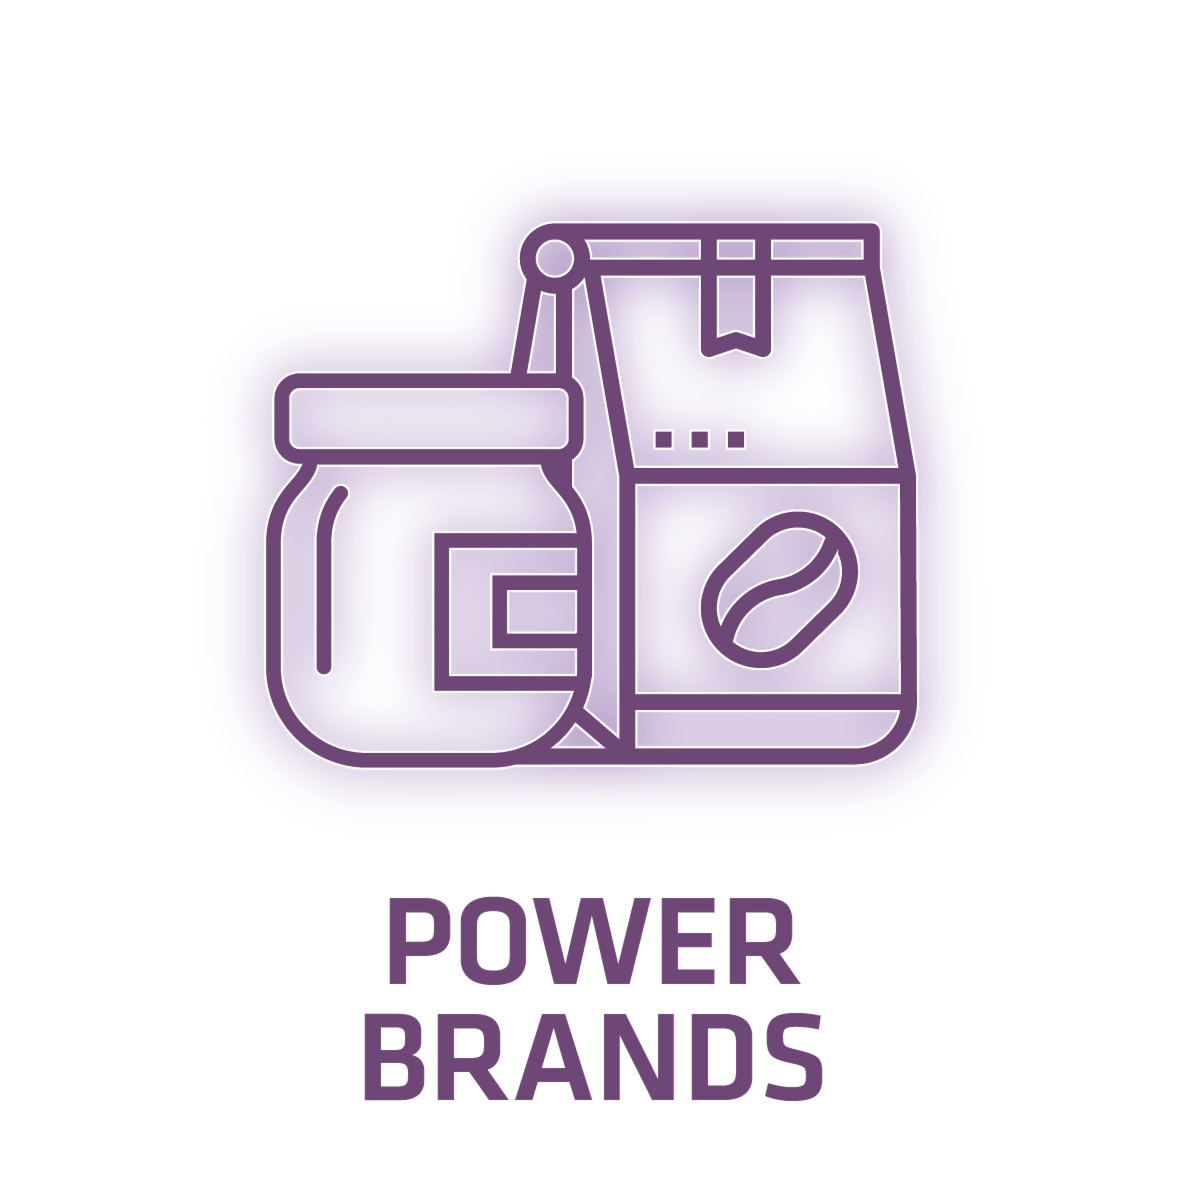 Gulfood power brands